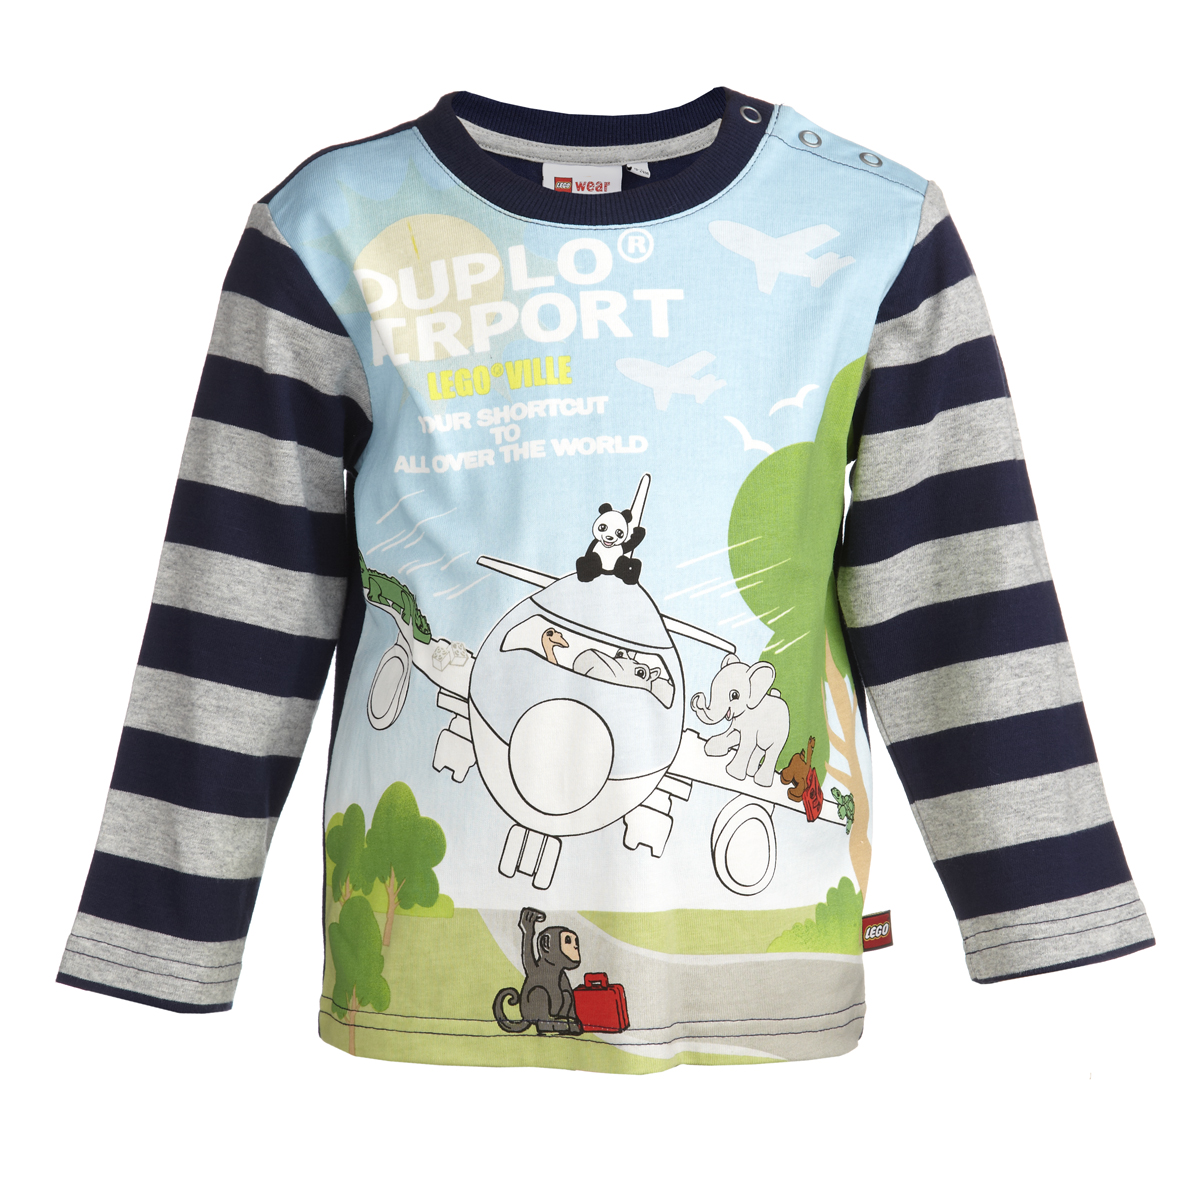 LEGOkläder - LEGO Wear Duplo långärmad t-shirt TINO 605 - Bokextra dfd1cdc54fbd8